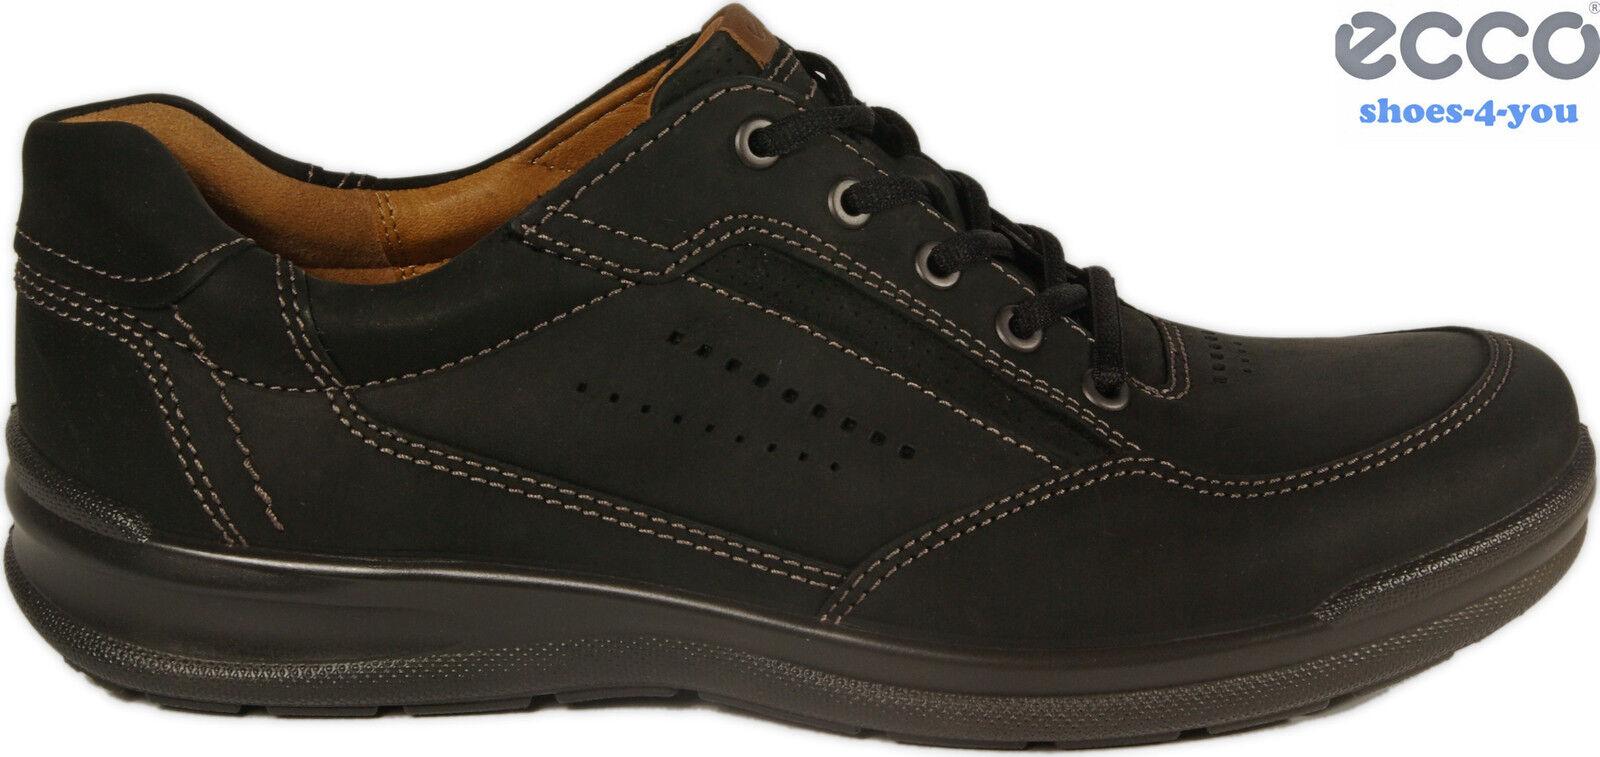 ECCO Schuhe Halbschuhe Mod. REMOTE schwarz echt Leder Schnürschuhe NEU